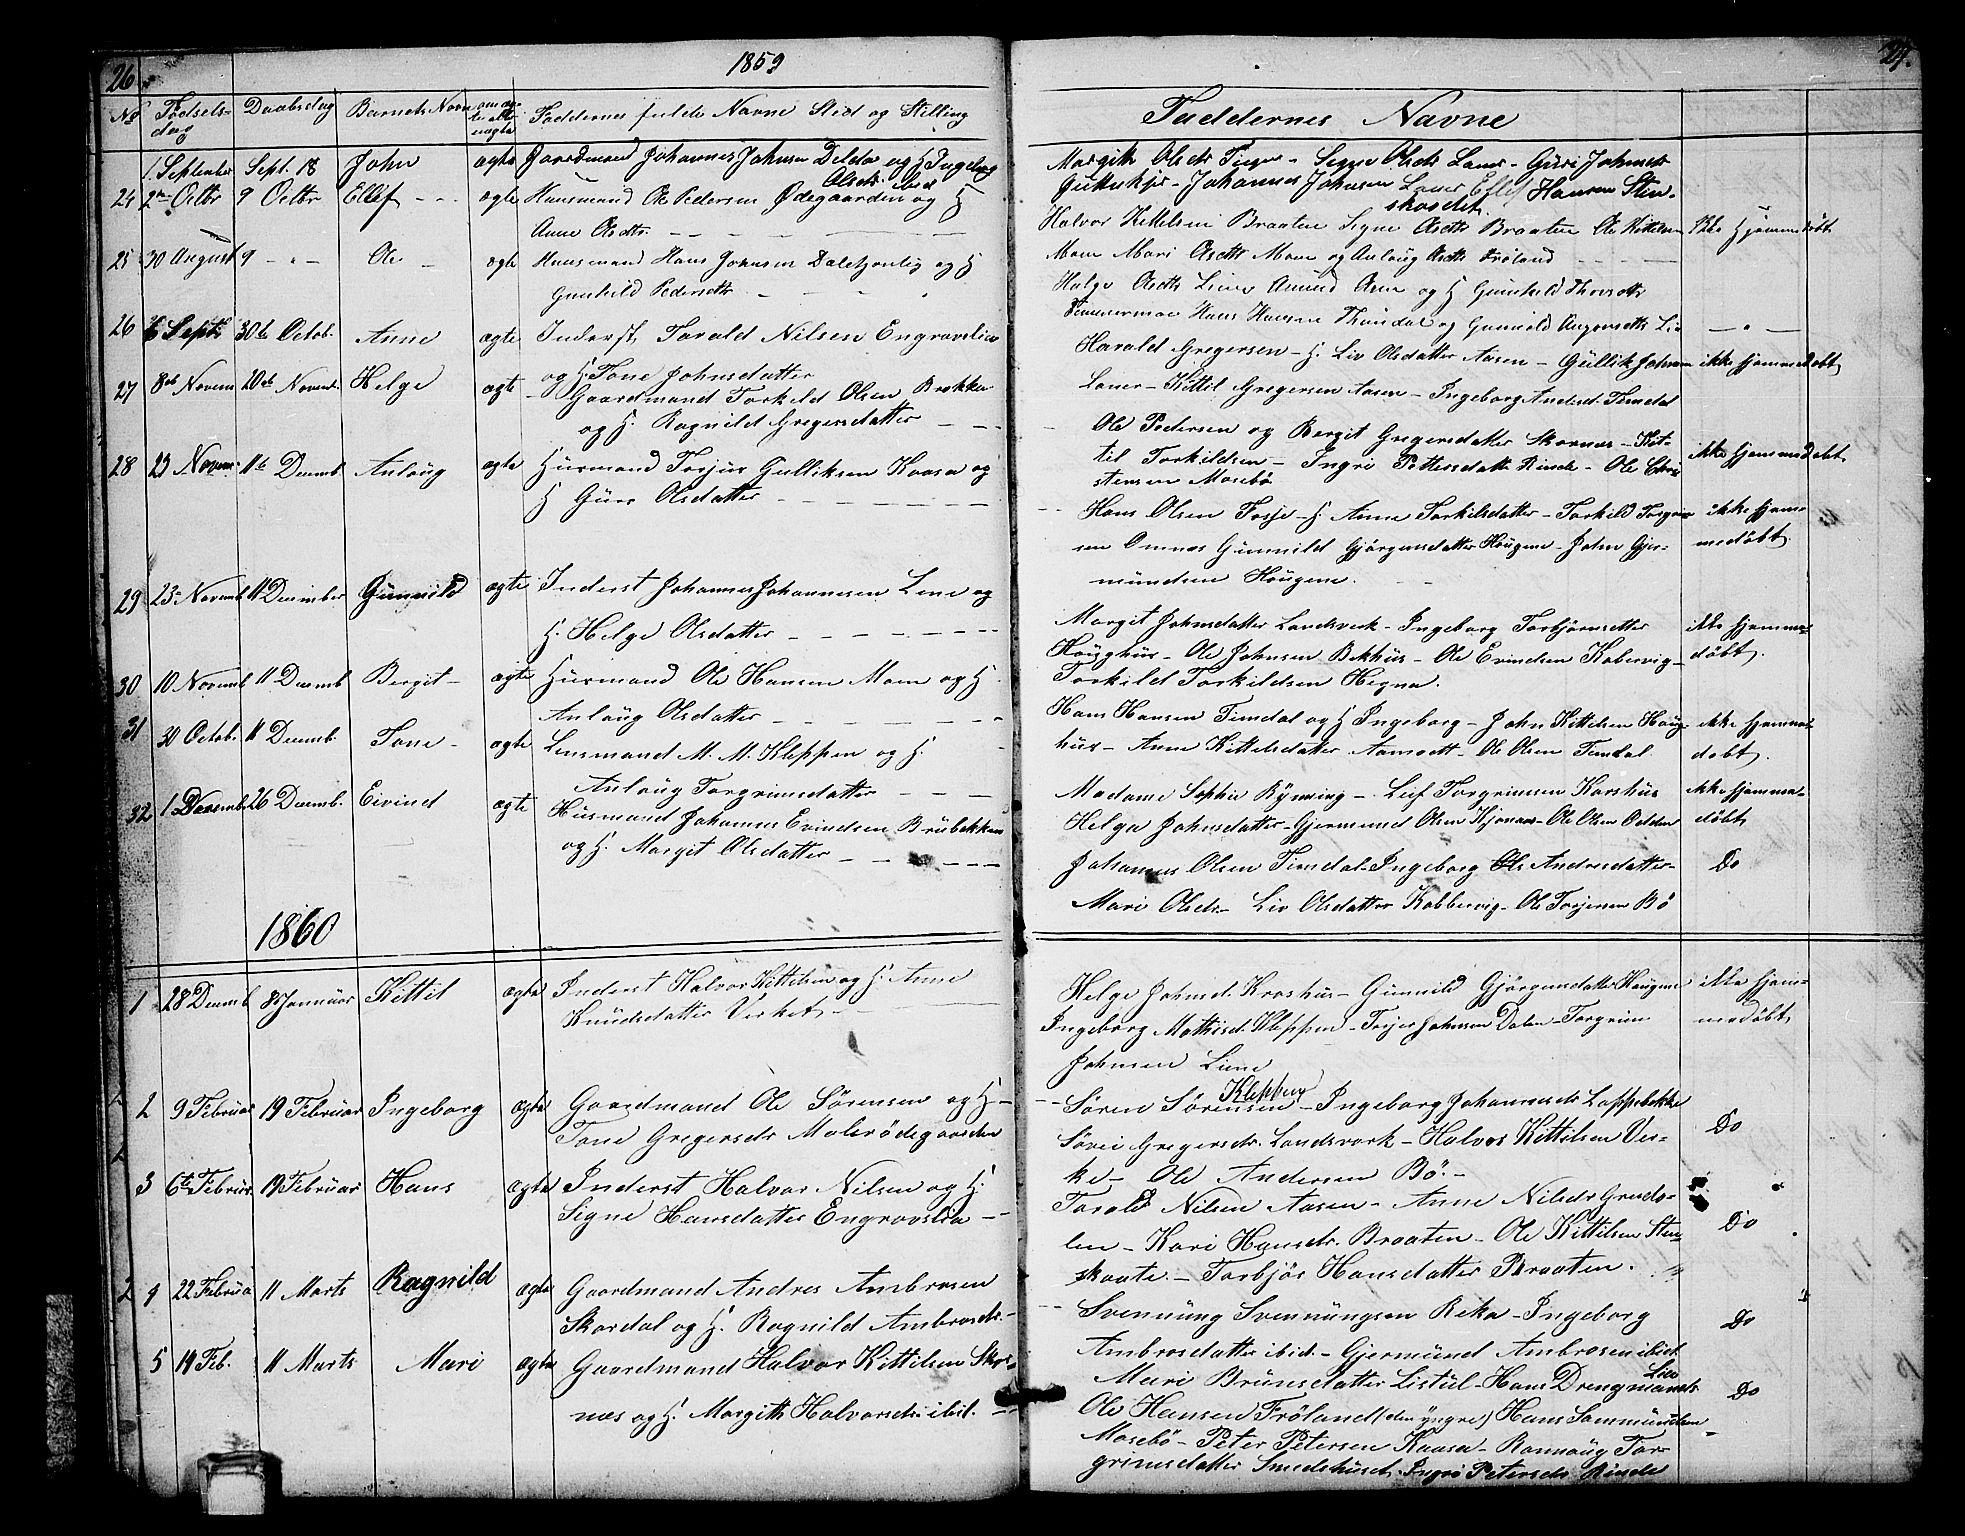 SAKO, Hjartdal kirkebøker, G/Gb/L0002: Klokkerbok nr. II 2, 1854-1884, s. 26-27